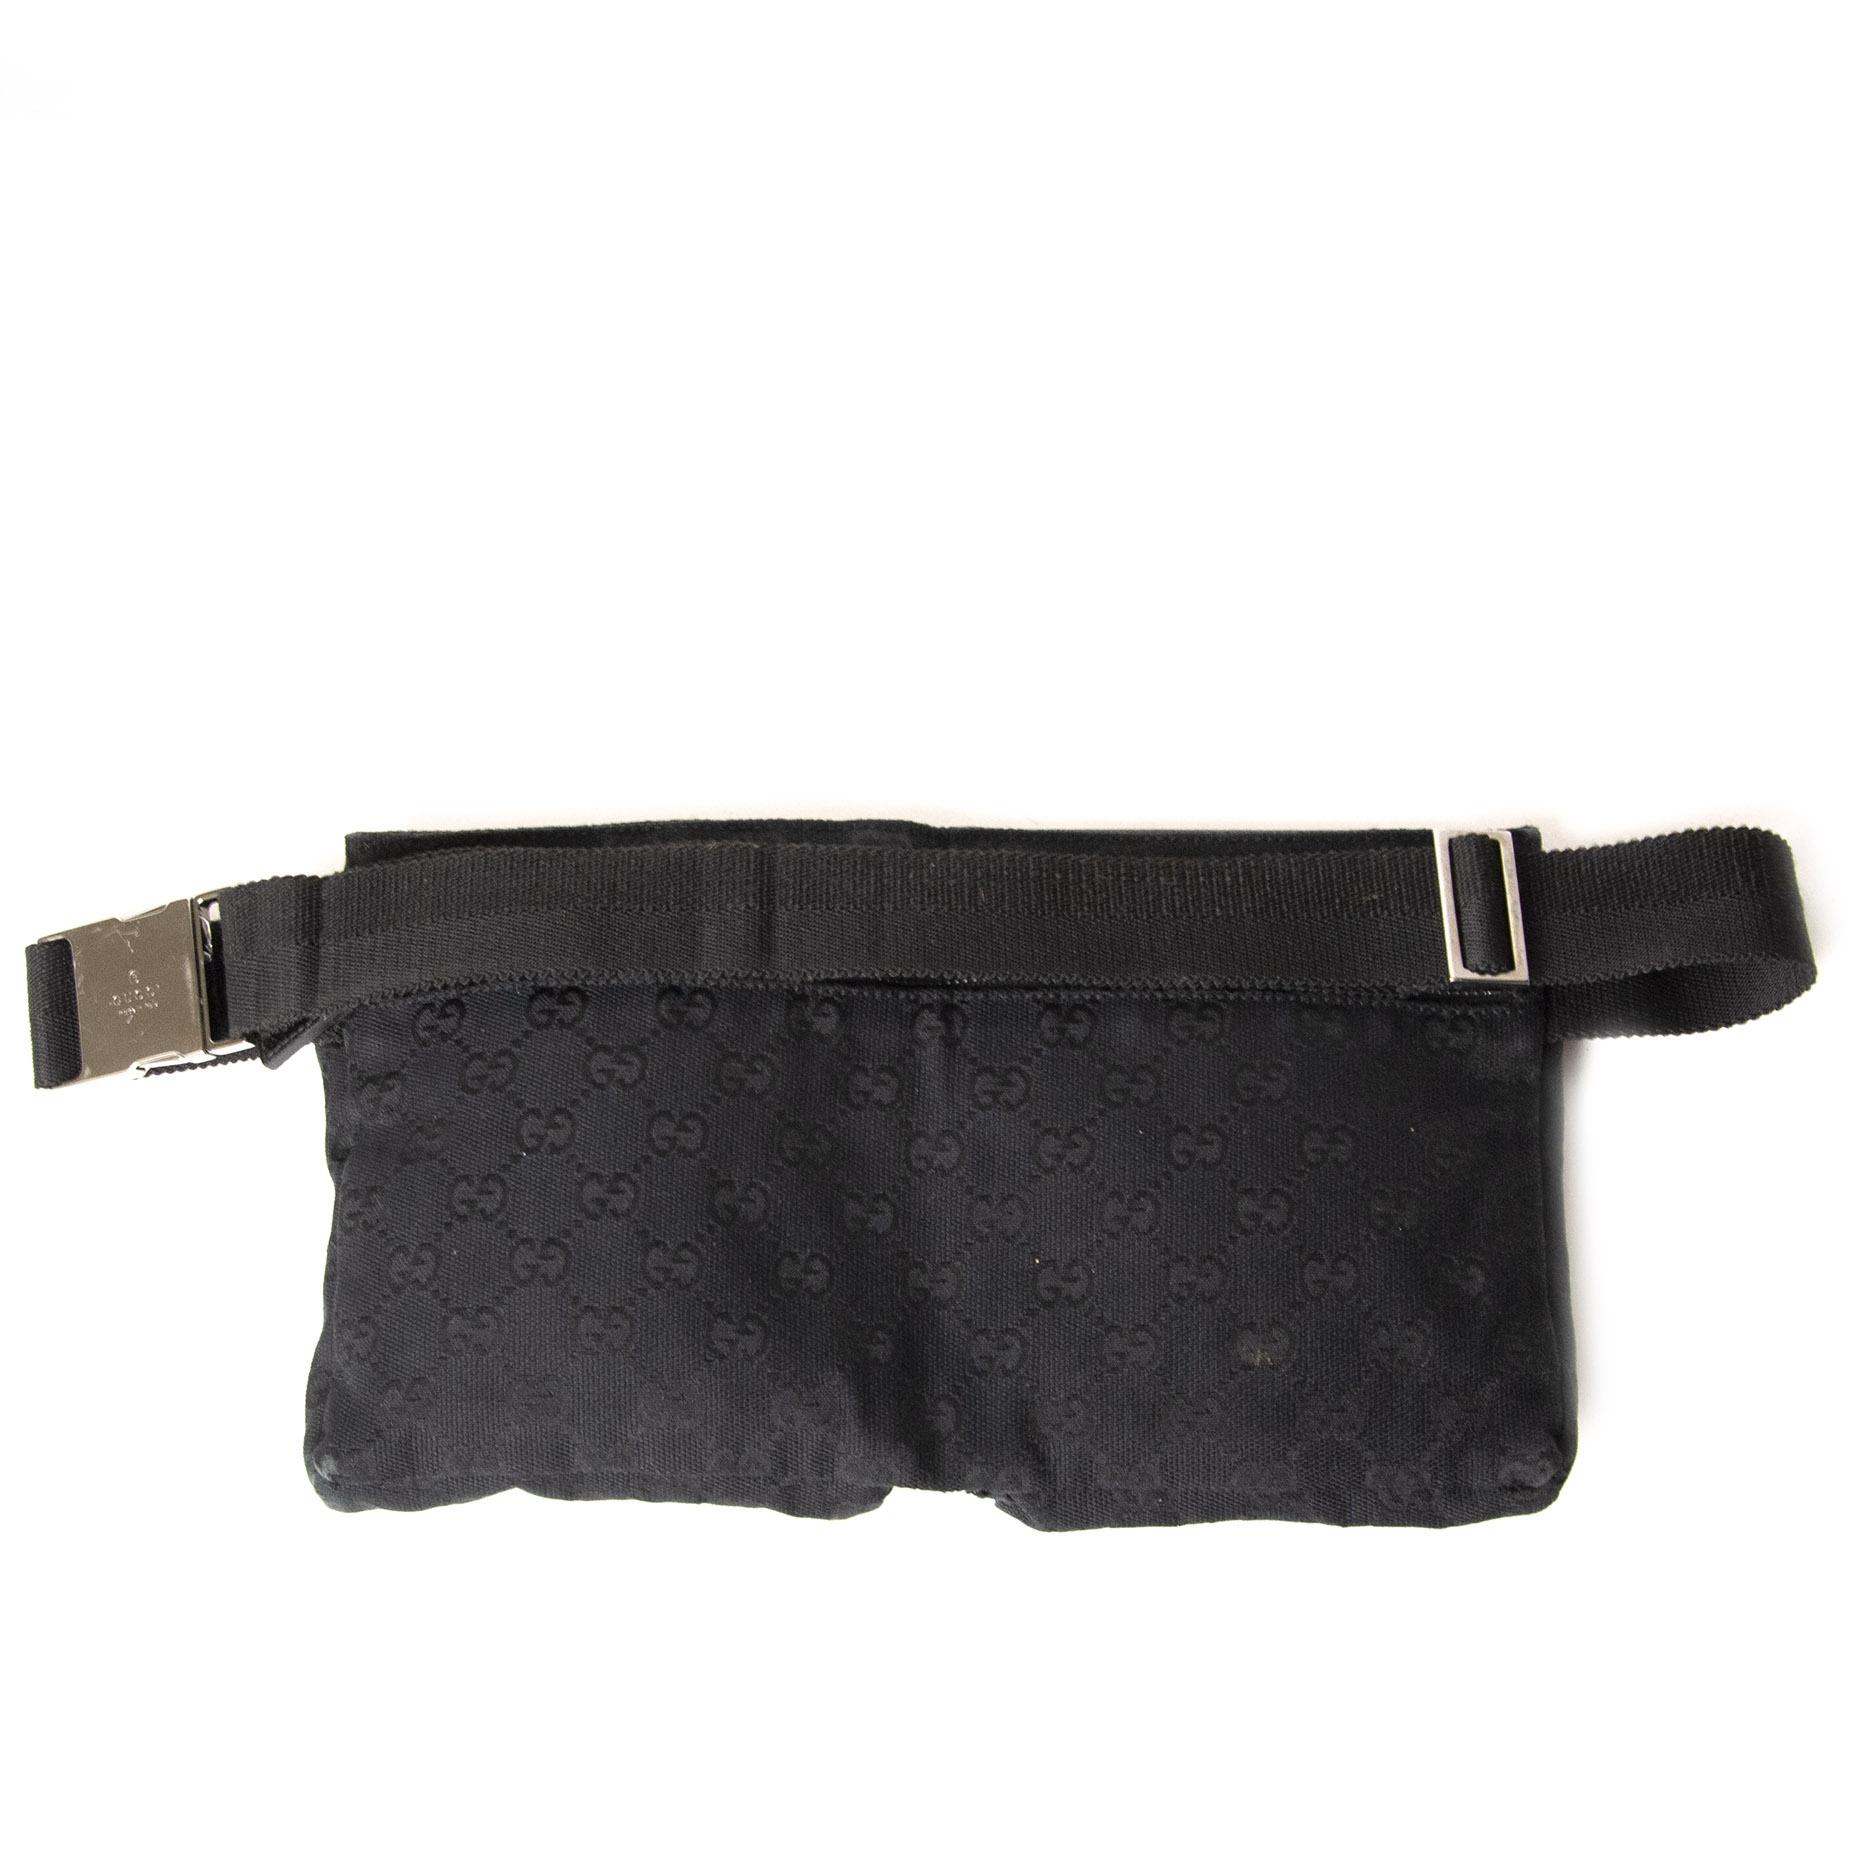 Gucci Black GG Monogram Canvas Belt Bag